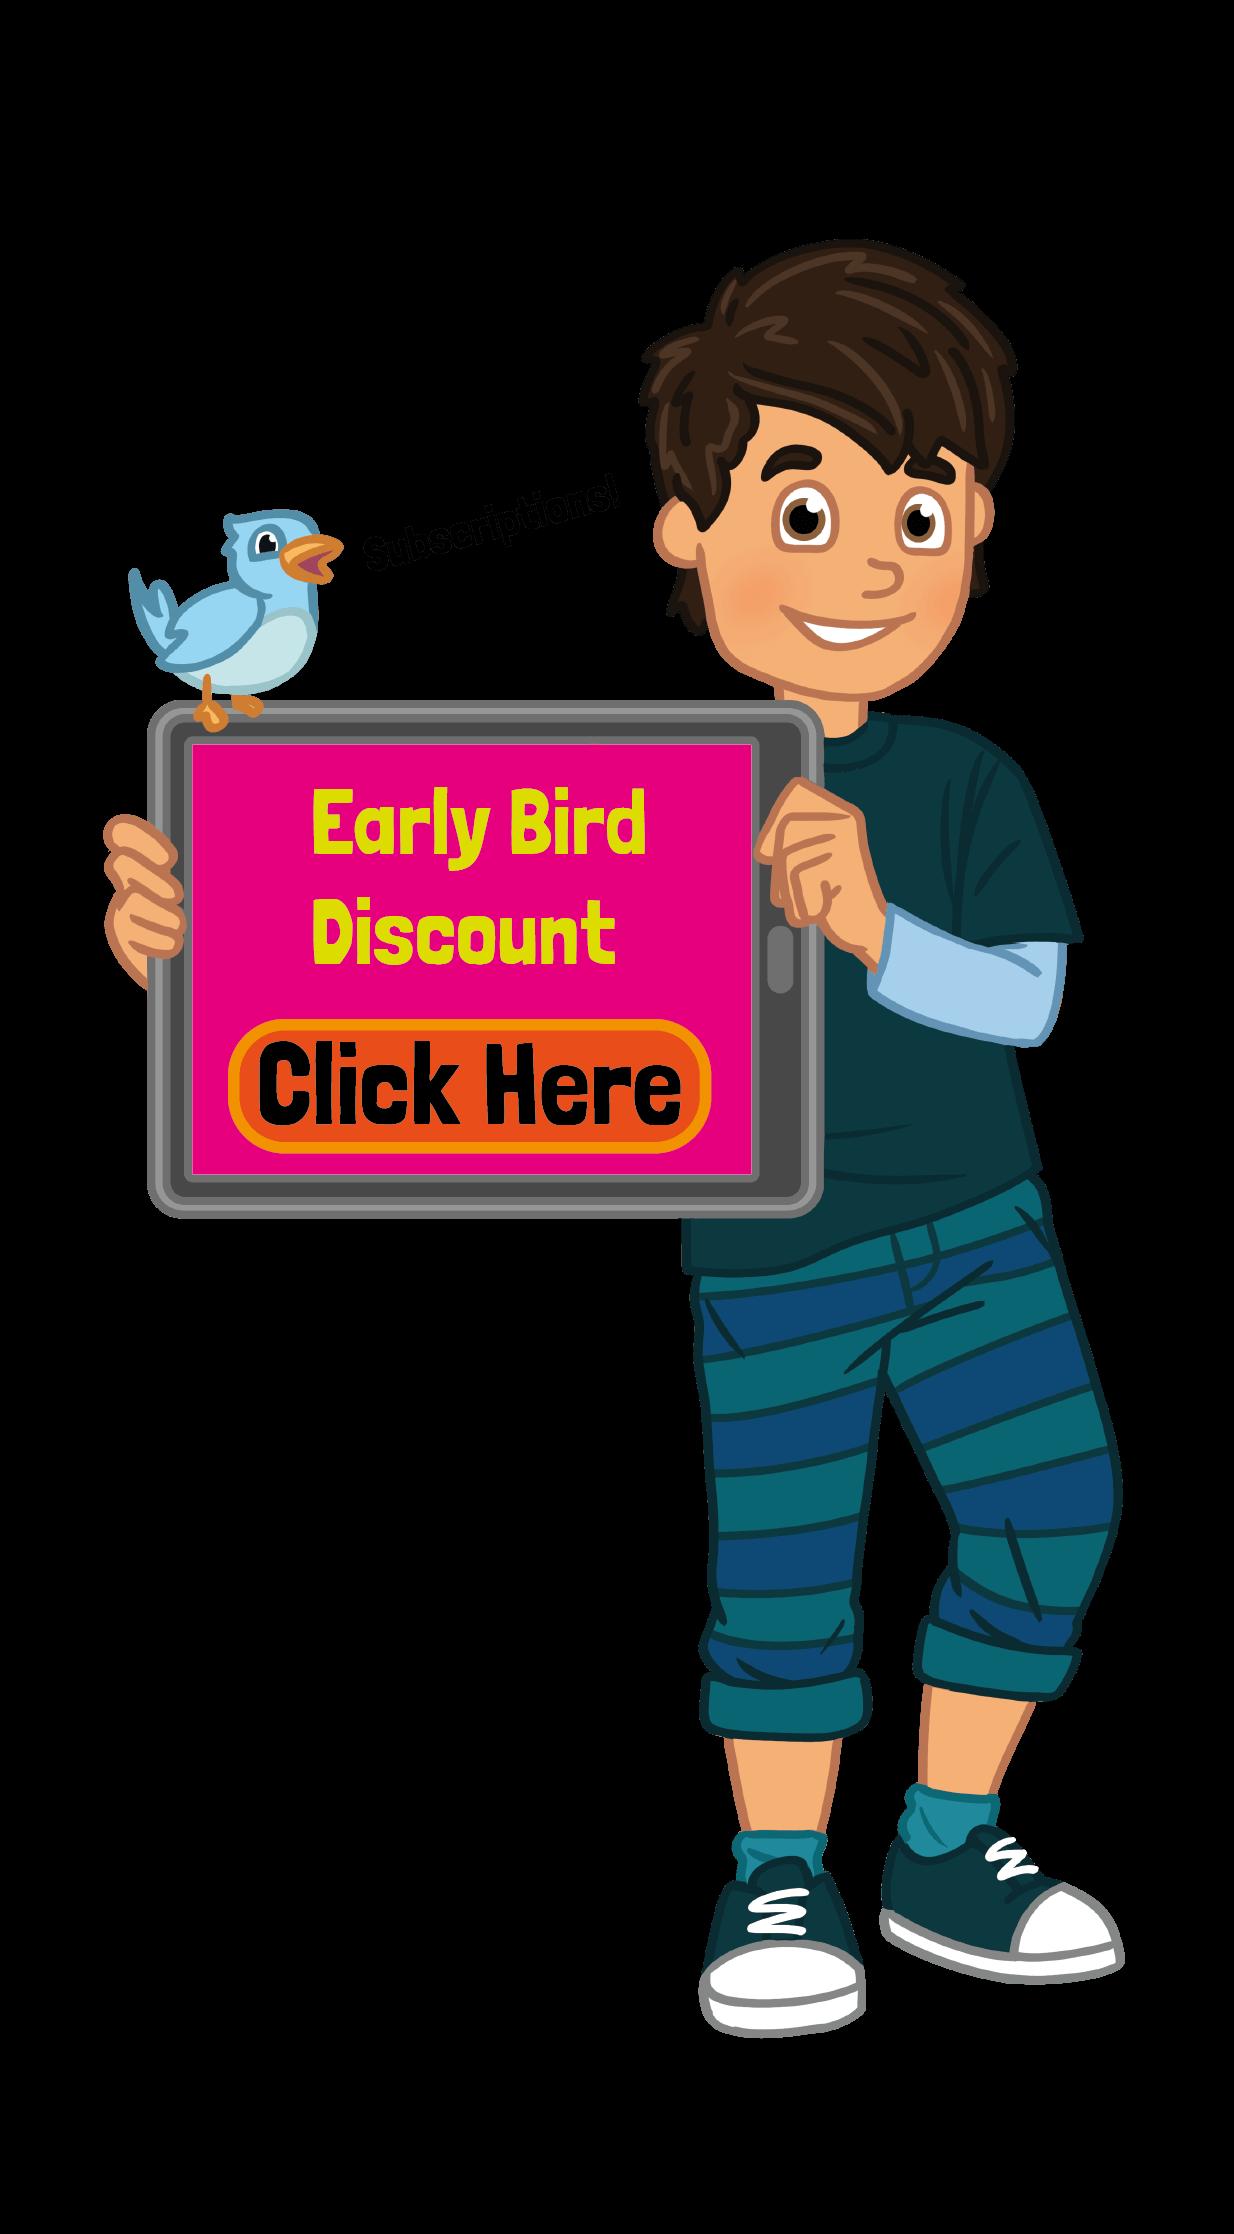 Early Bird discount boy